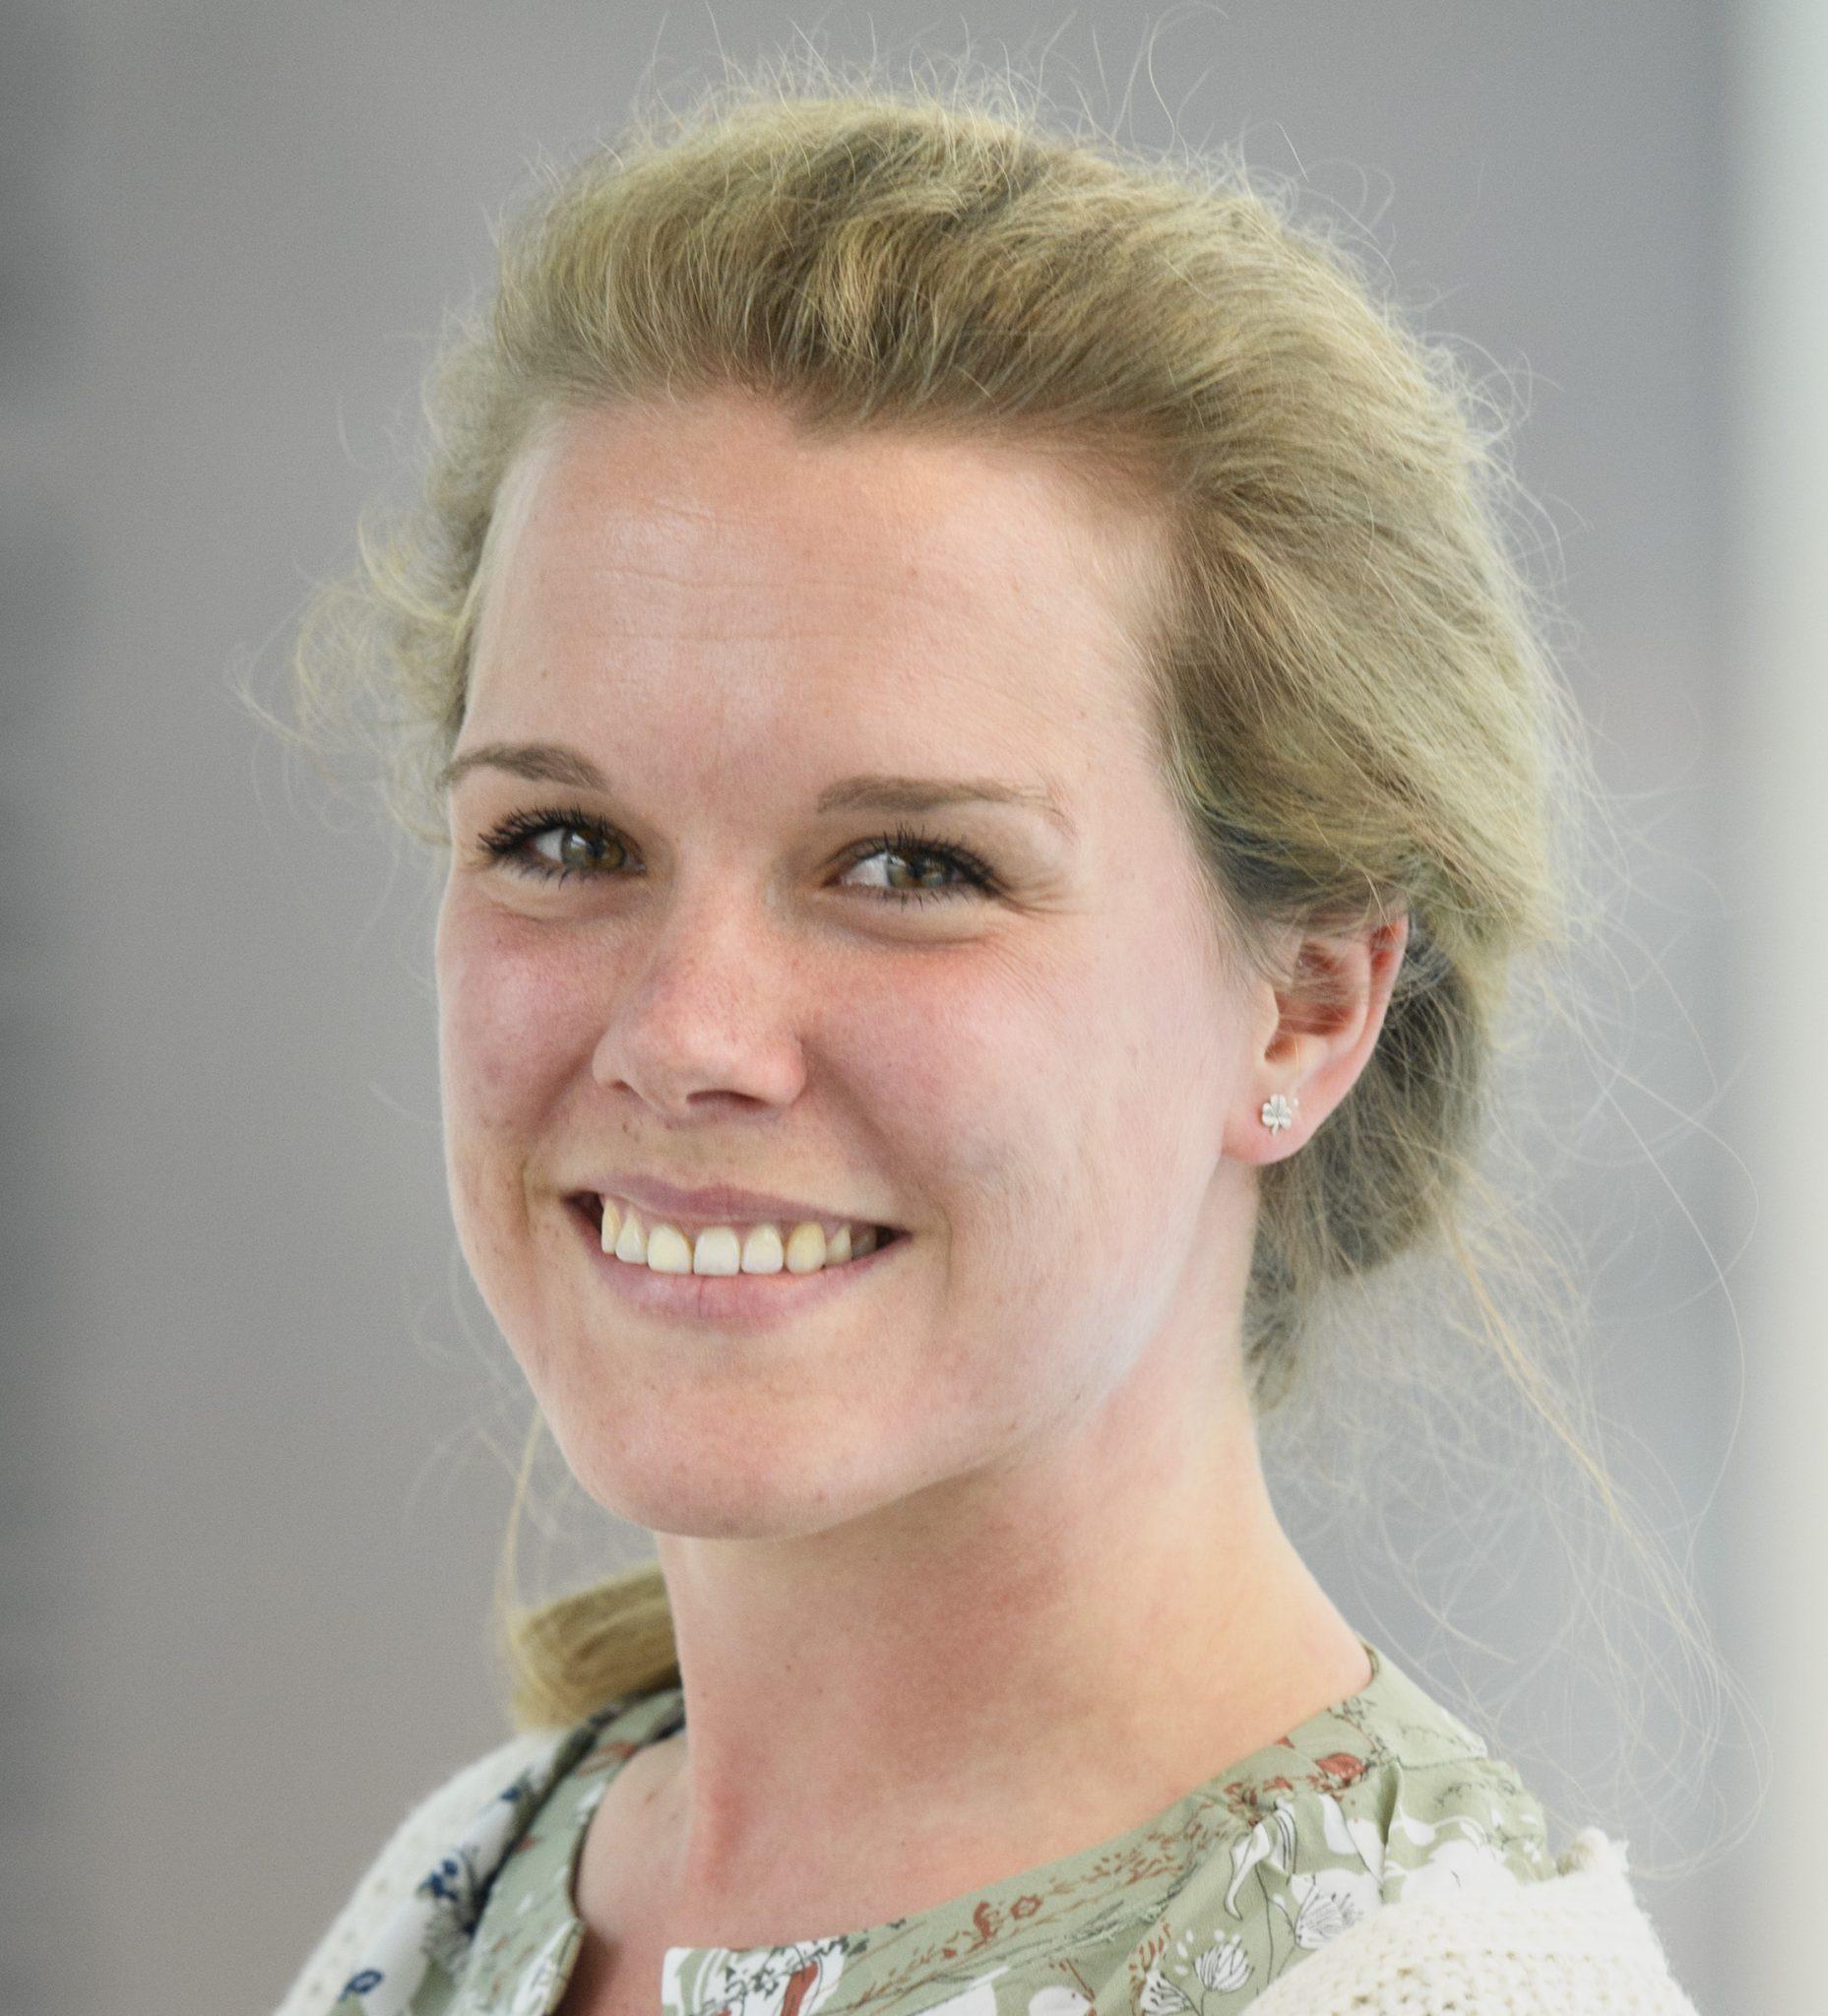 Elena Gijtenbeek